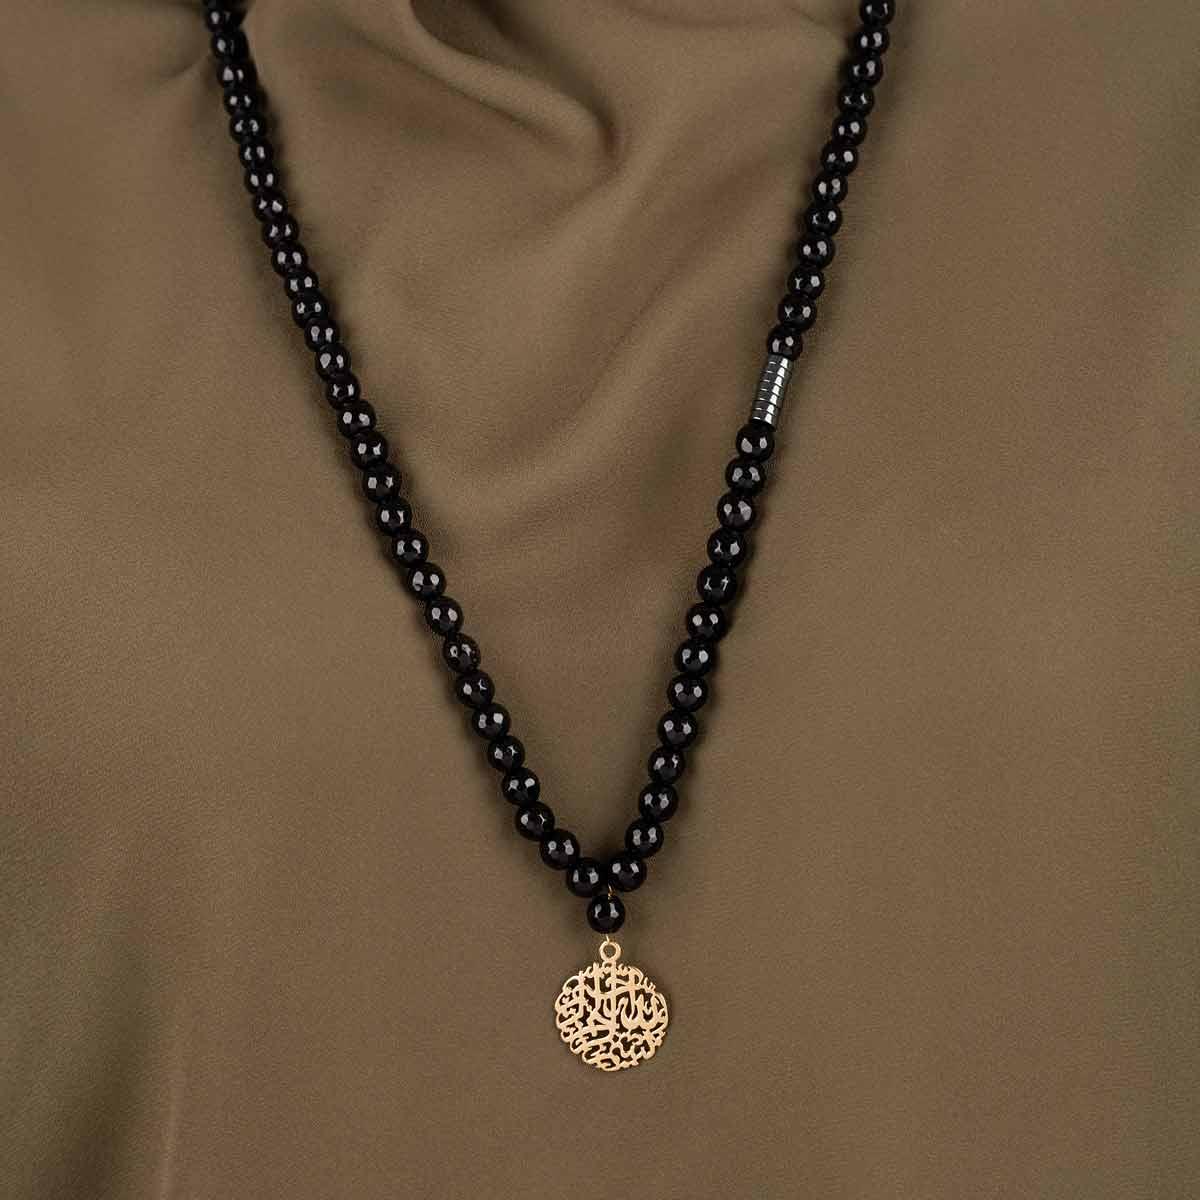 گردنبند طلا سنگی بسم الله کوچک